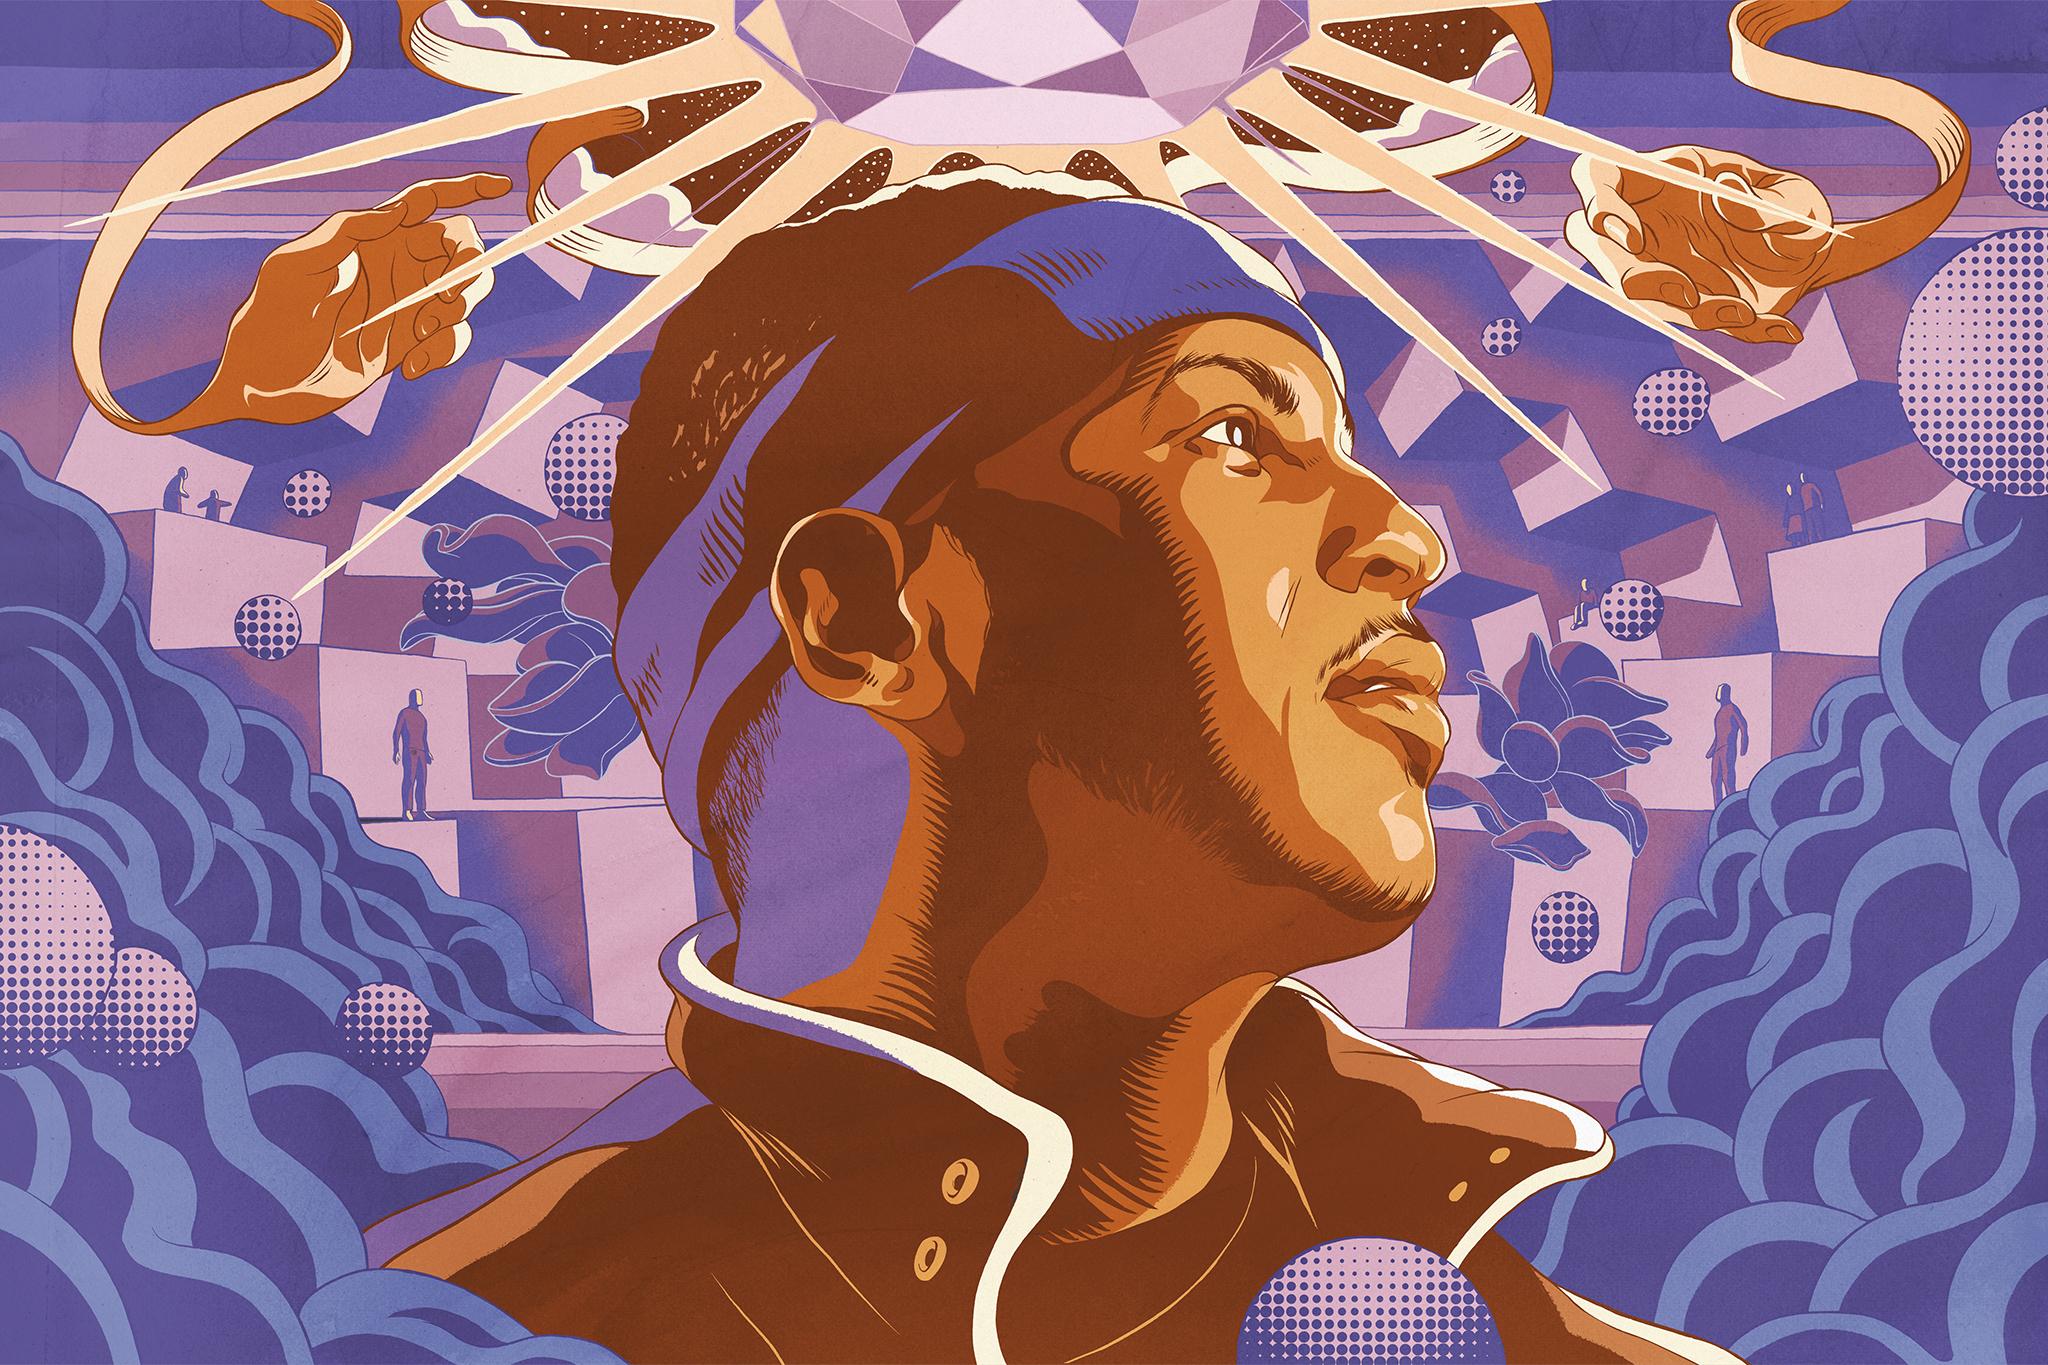 Cun Shi Illustration Art Carmelo Anthony Bleacher Report Knicks Basketball